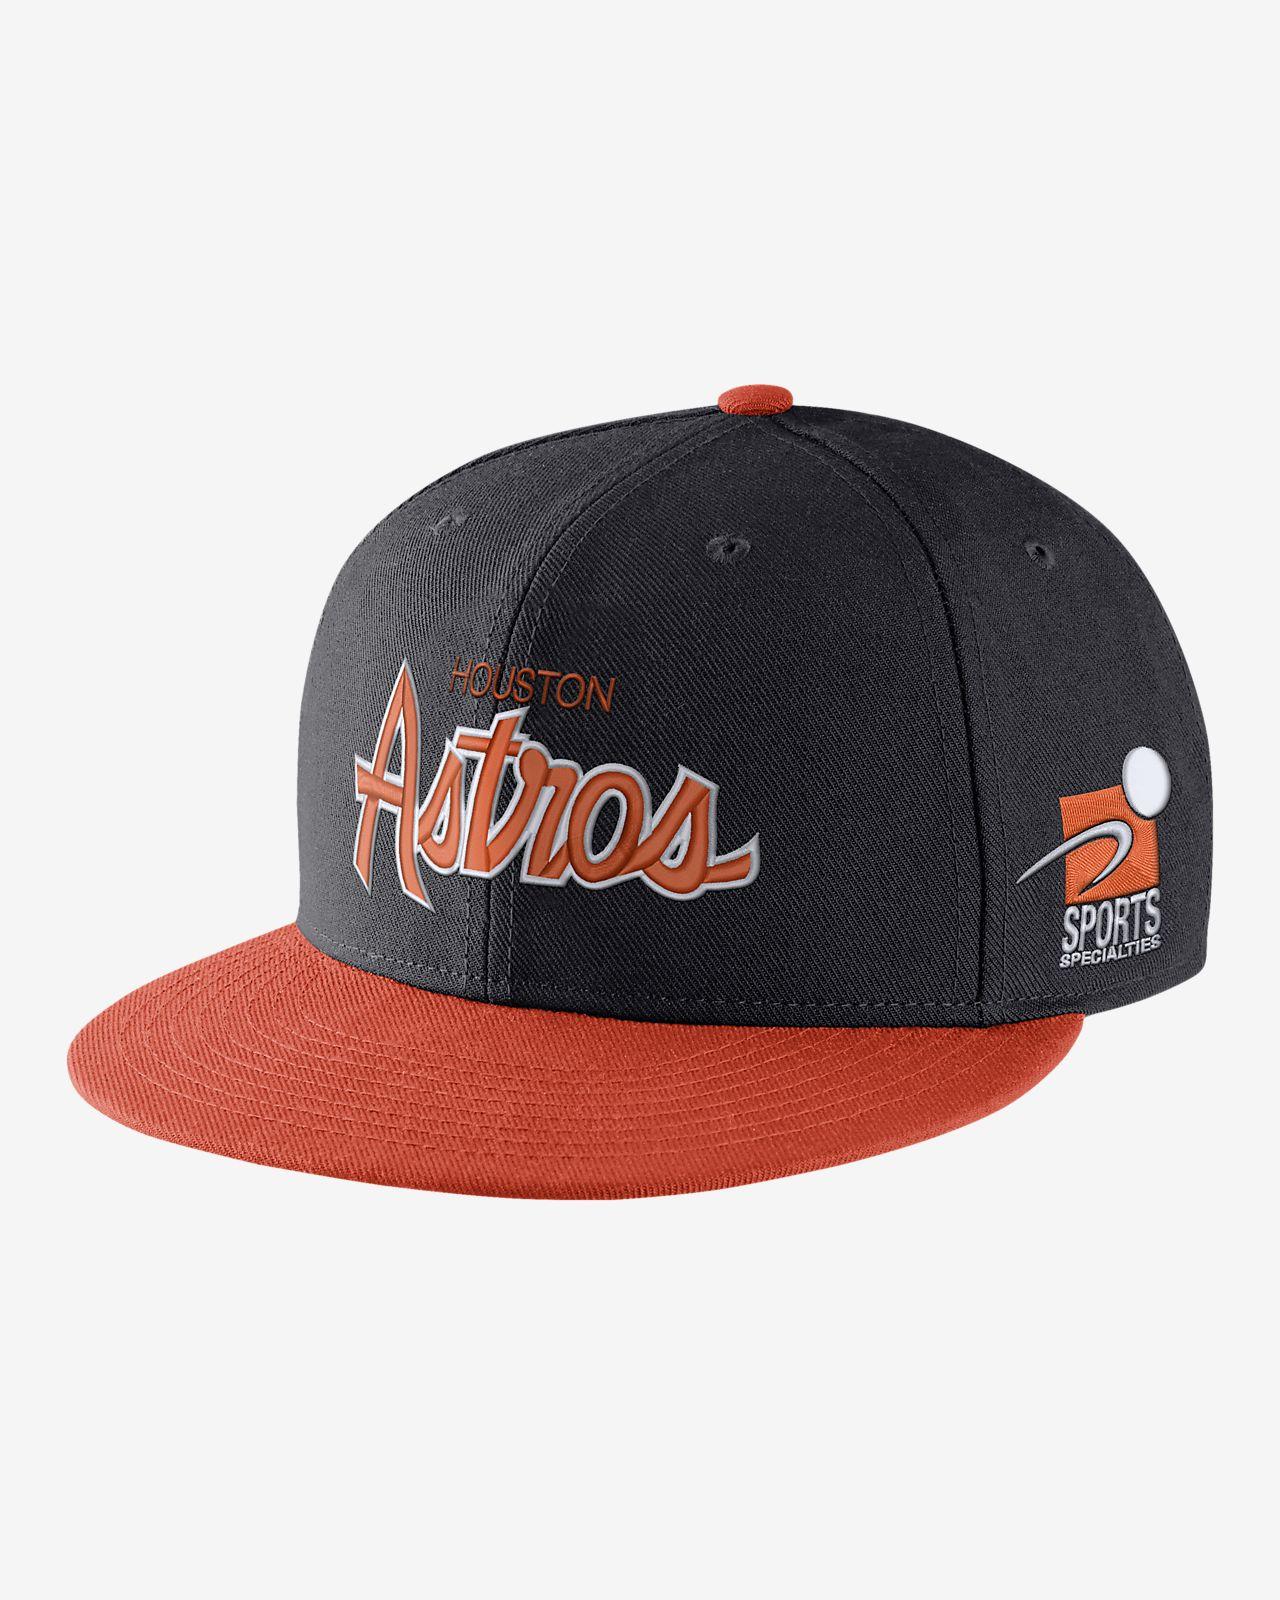 Nike Pro Sport Specialties (MLB Astros) Adjustable Hat